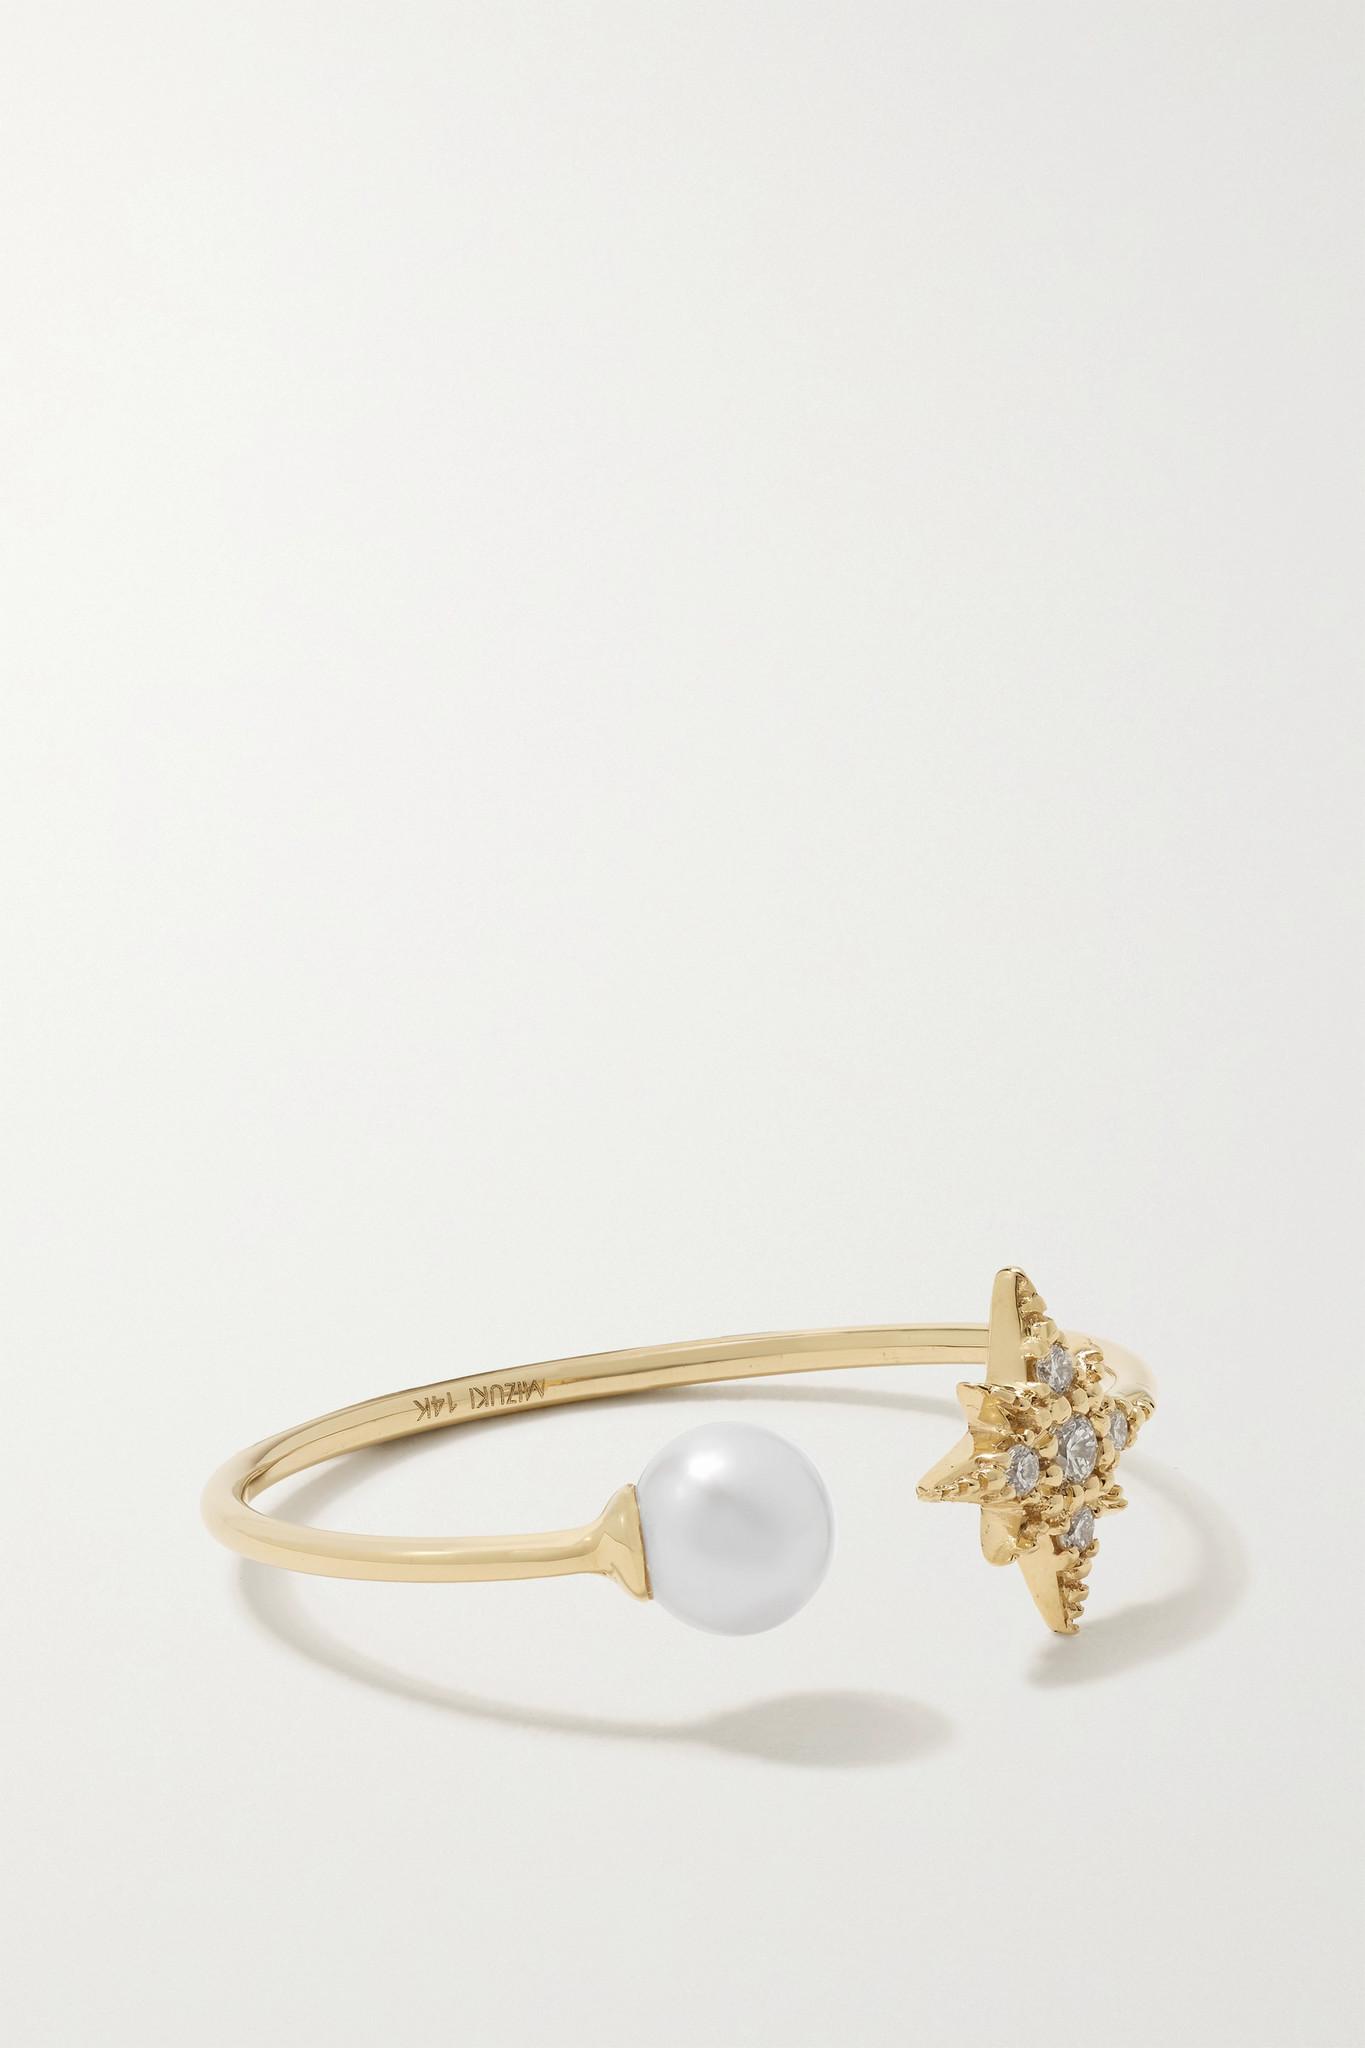 MIZUKI - 14-karat Gold, Pearl And Diamond Ring - 6